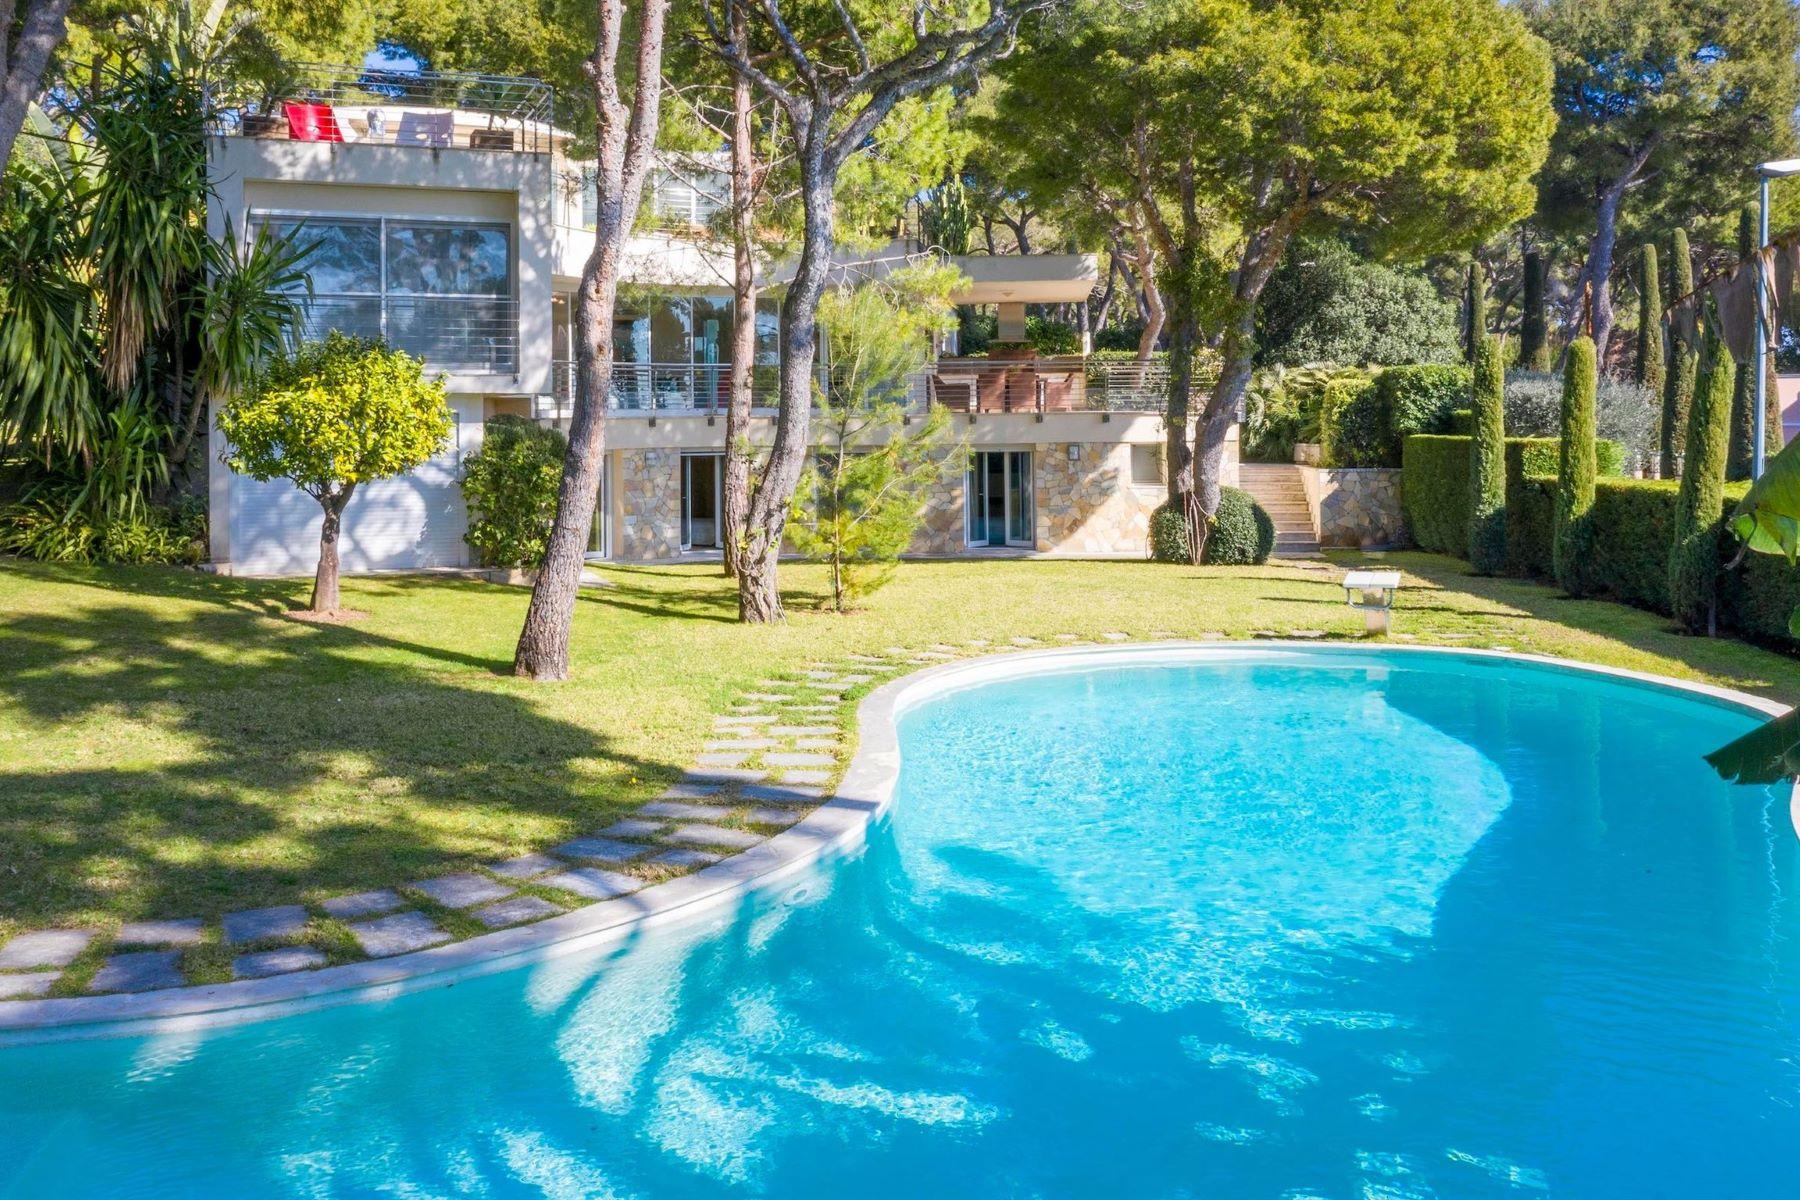 single family homes for Sale at Modern design Villa on Saint Jean Cap Ferrat close to the Grand Hotel Saint Jean Cap Ferrat, Provence-Alpes-Cote D'Azur 06230 France